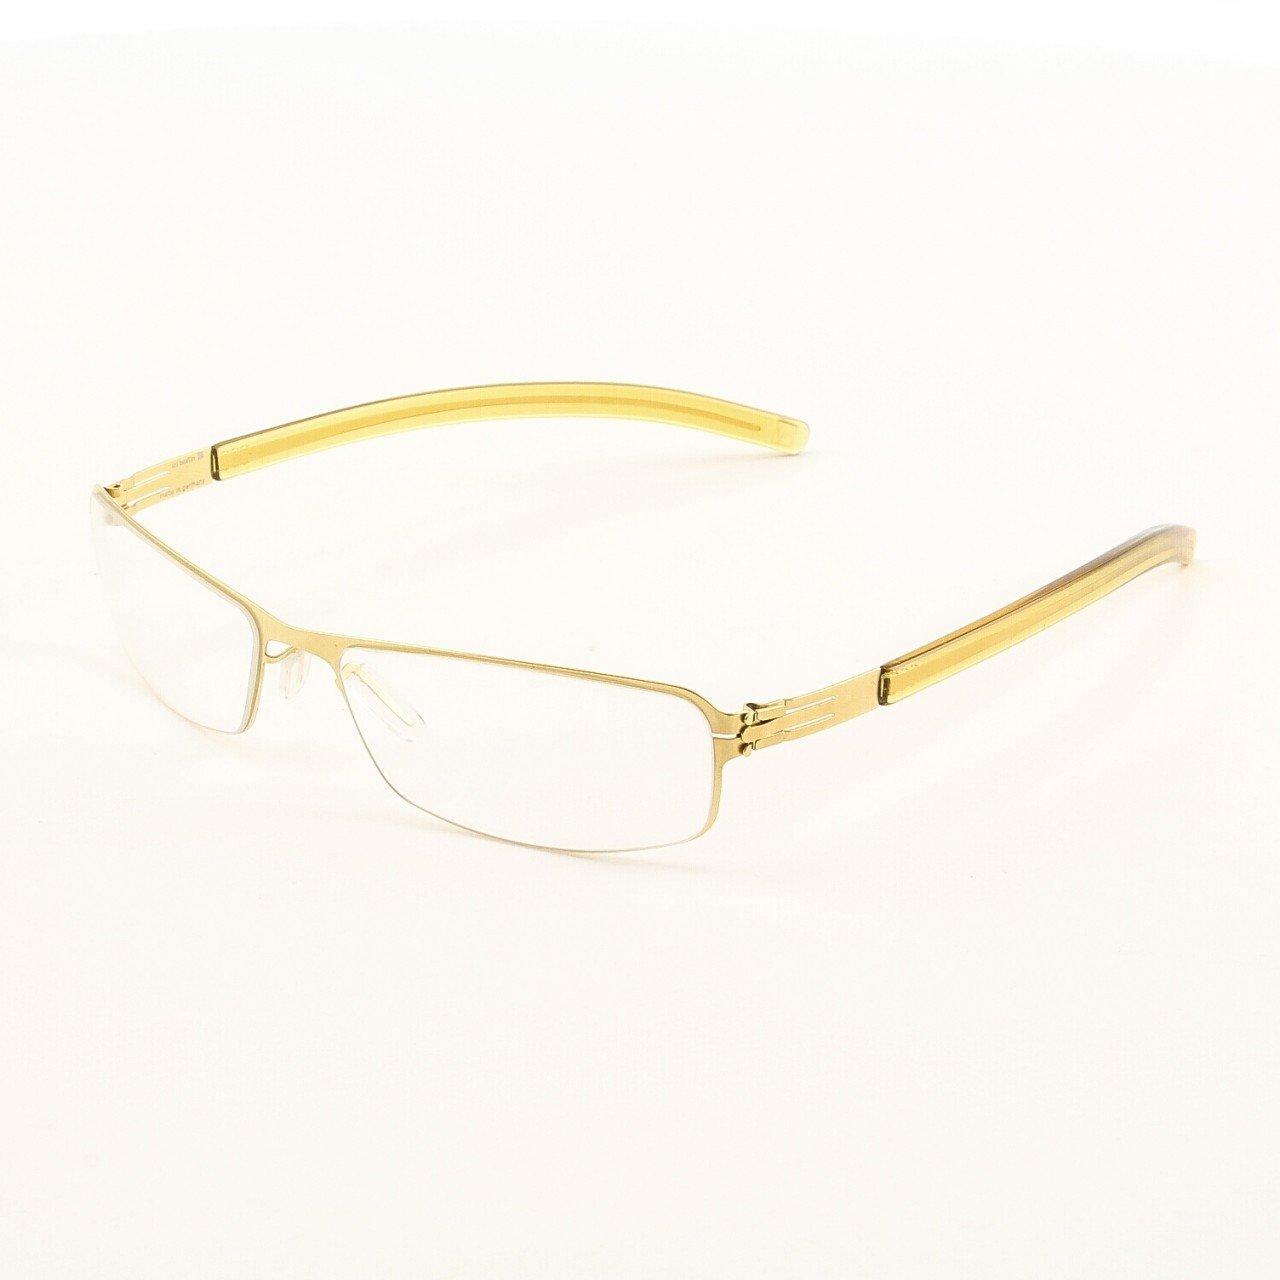 ic! Berlin Heringsdorf Eyeglasses Col. Gold with Clear Lenses